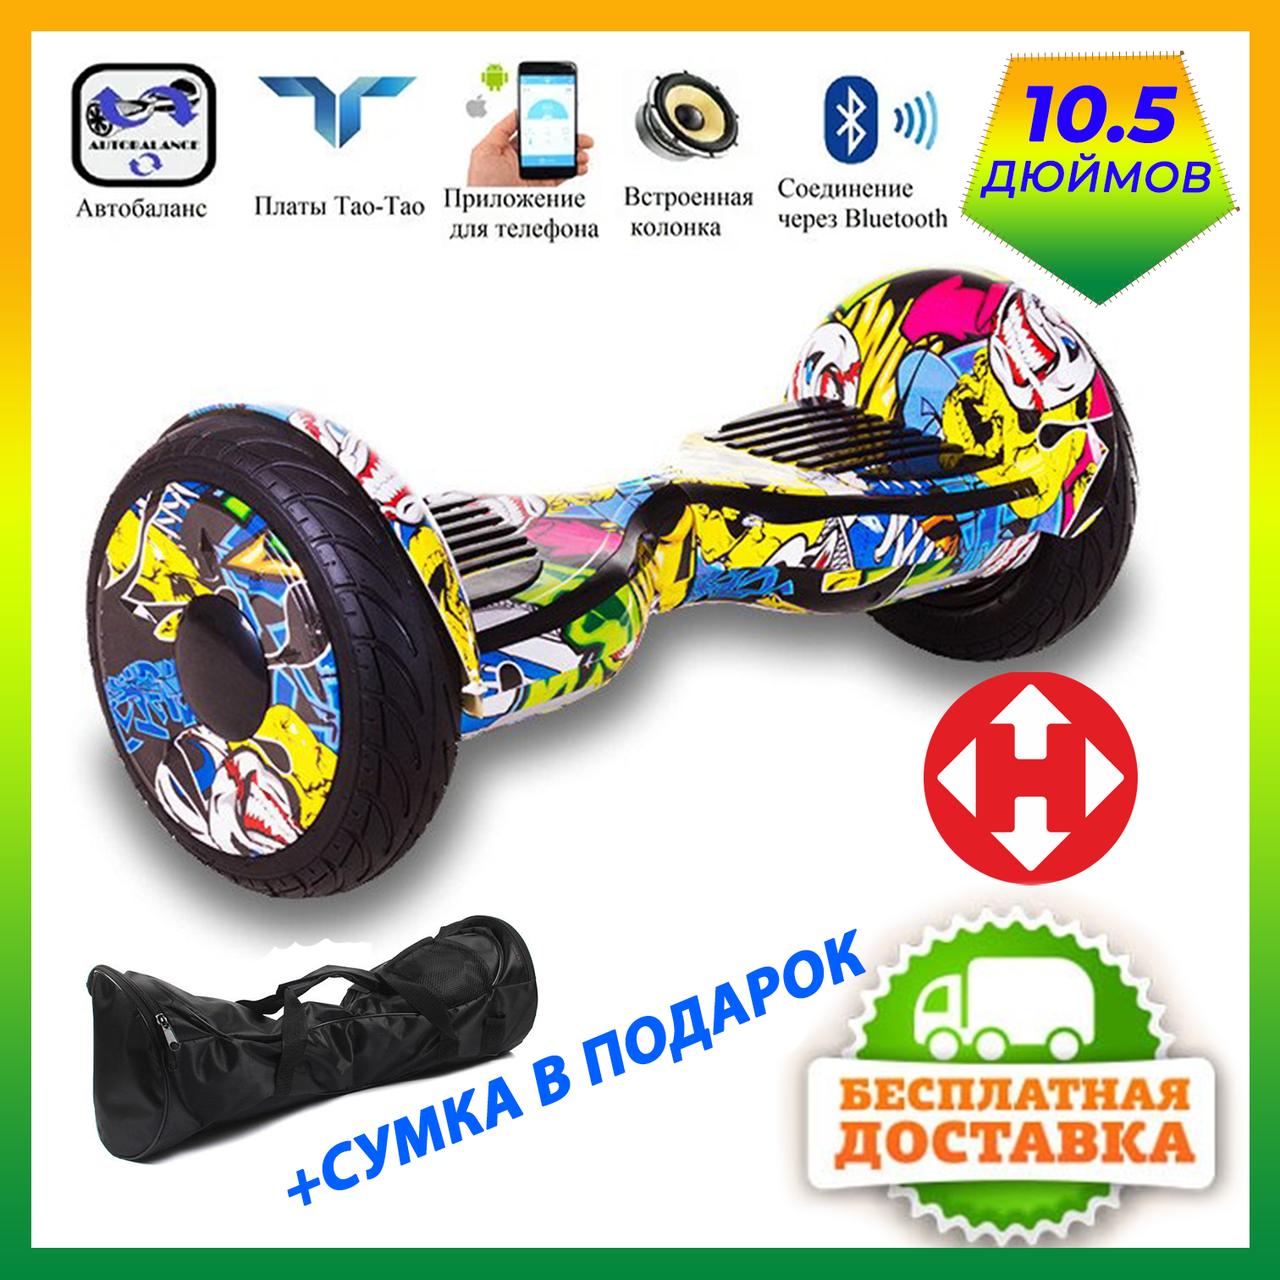 ГИРОСКУТЕР SMART BALANCE PREMIUM PRO 10.5 дюймов Wheel Хип-Хоп TaoTao APP автобаланс, гироборд Гіроскутер